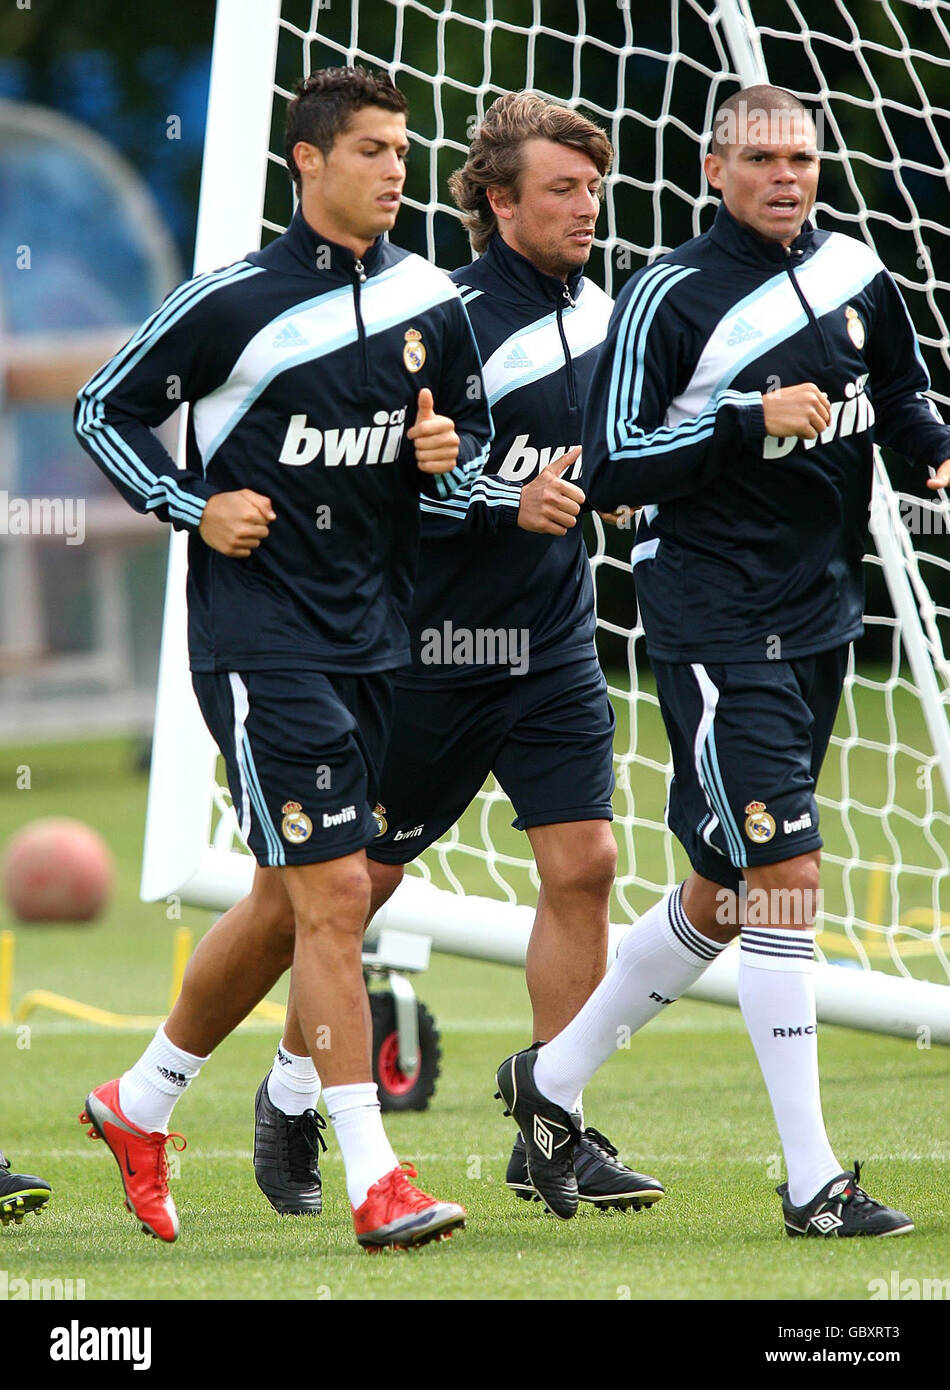 Footballer Real Madrid Soccer Stock Photos Footballer Real